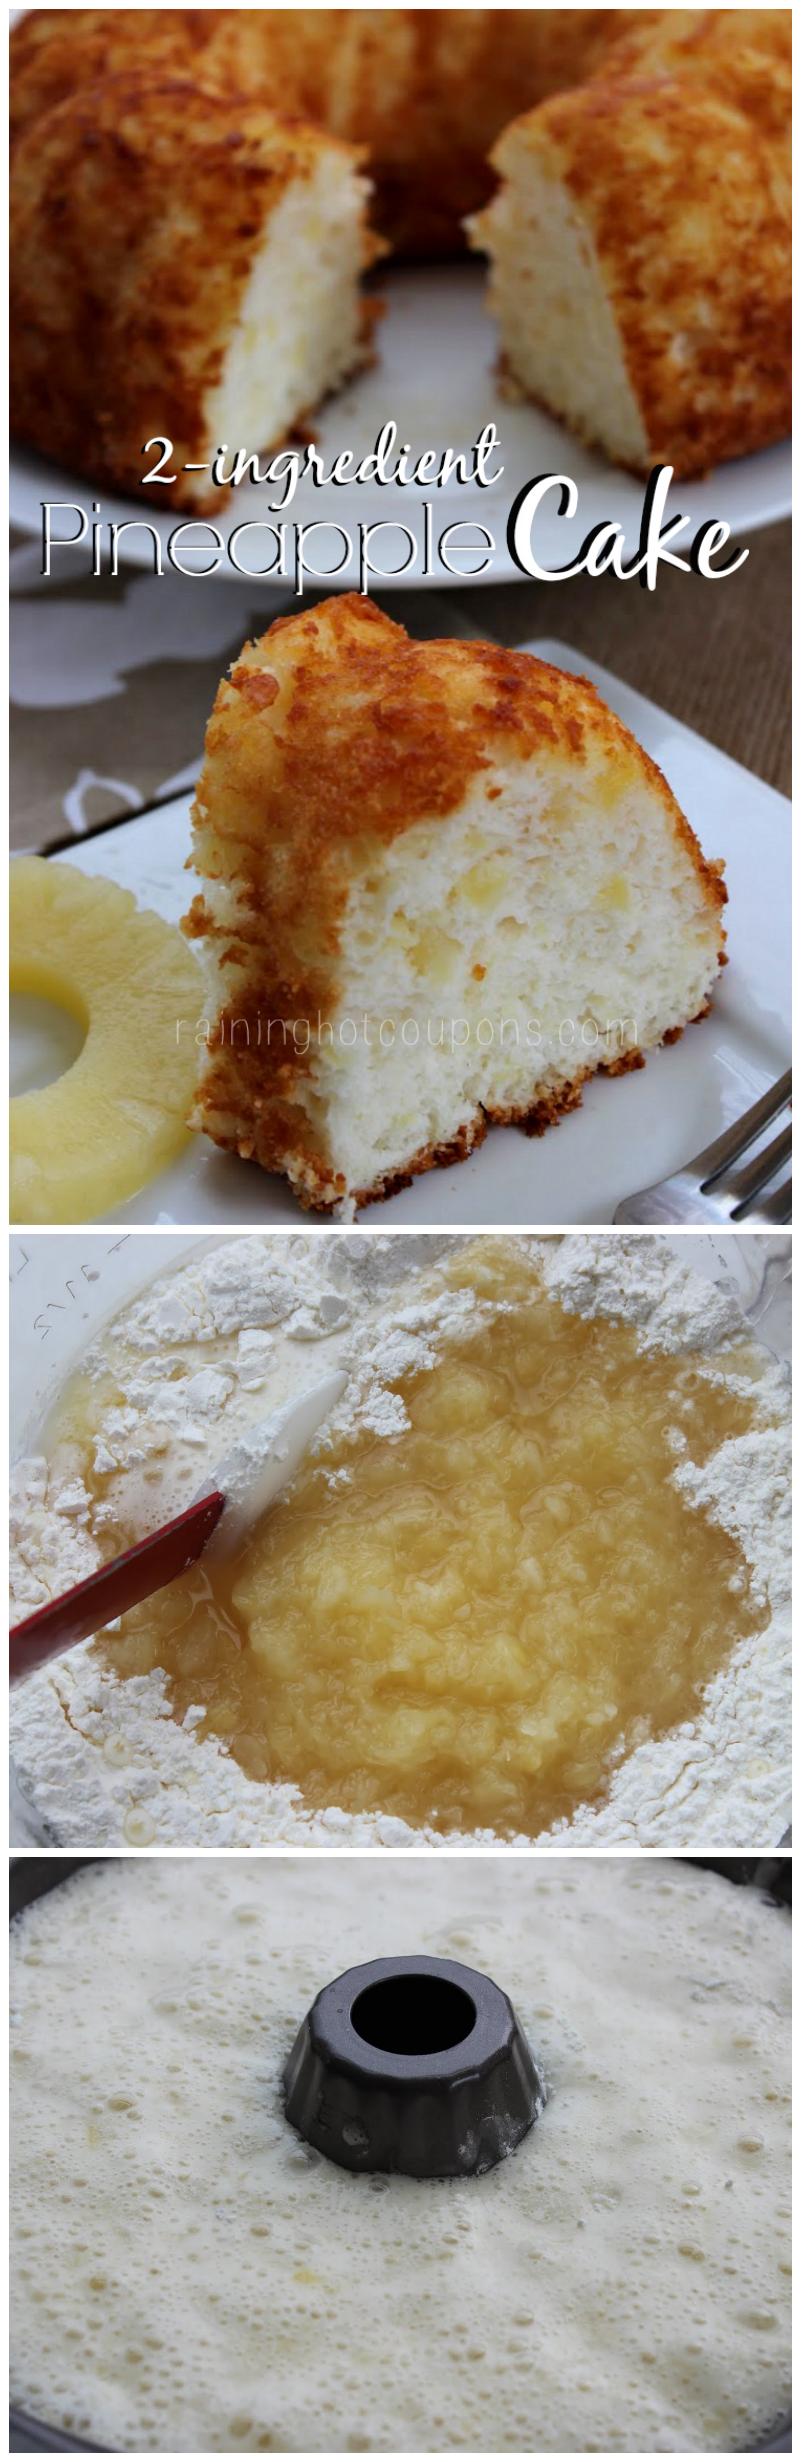 Angel Food Cake Mix Crushed Pineapple Bundt Pan